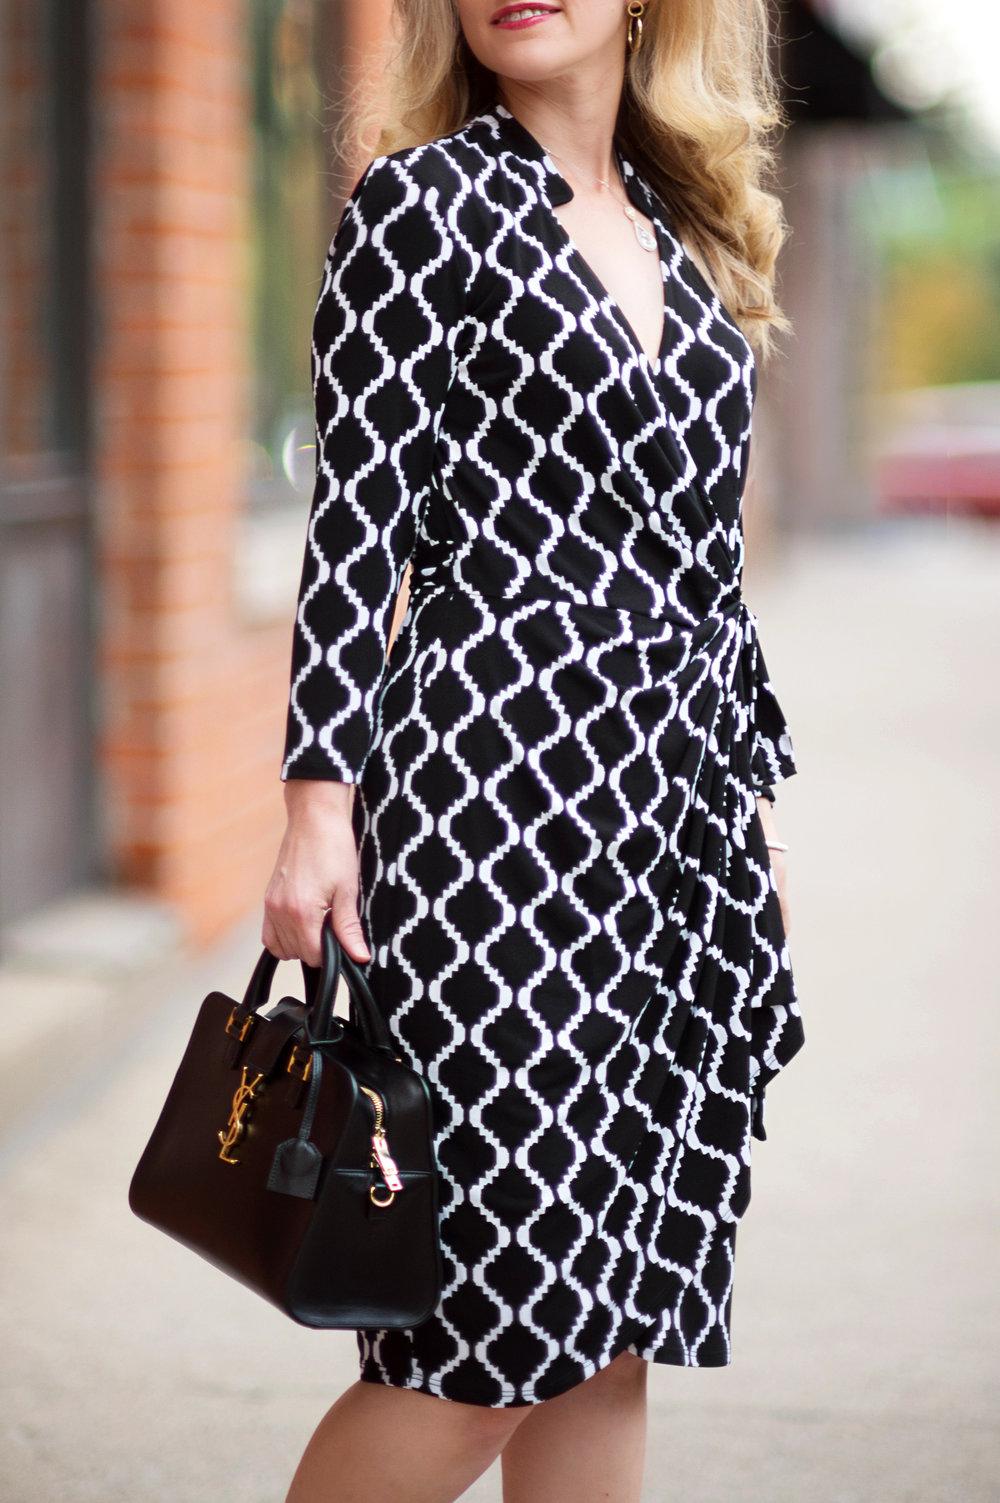 Petite-Fashion-and-Style-Blog---Maggy-London-Philomena-Dress-5.jpg